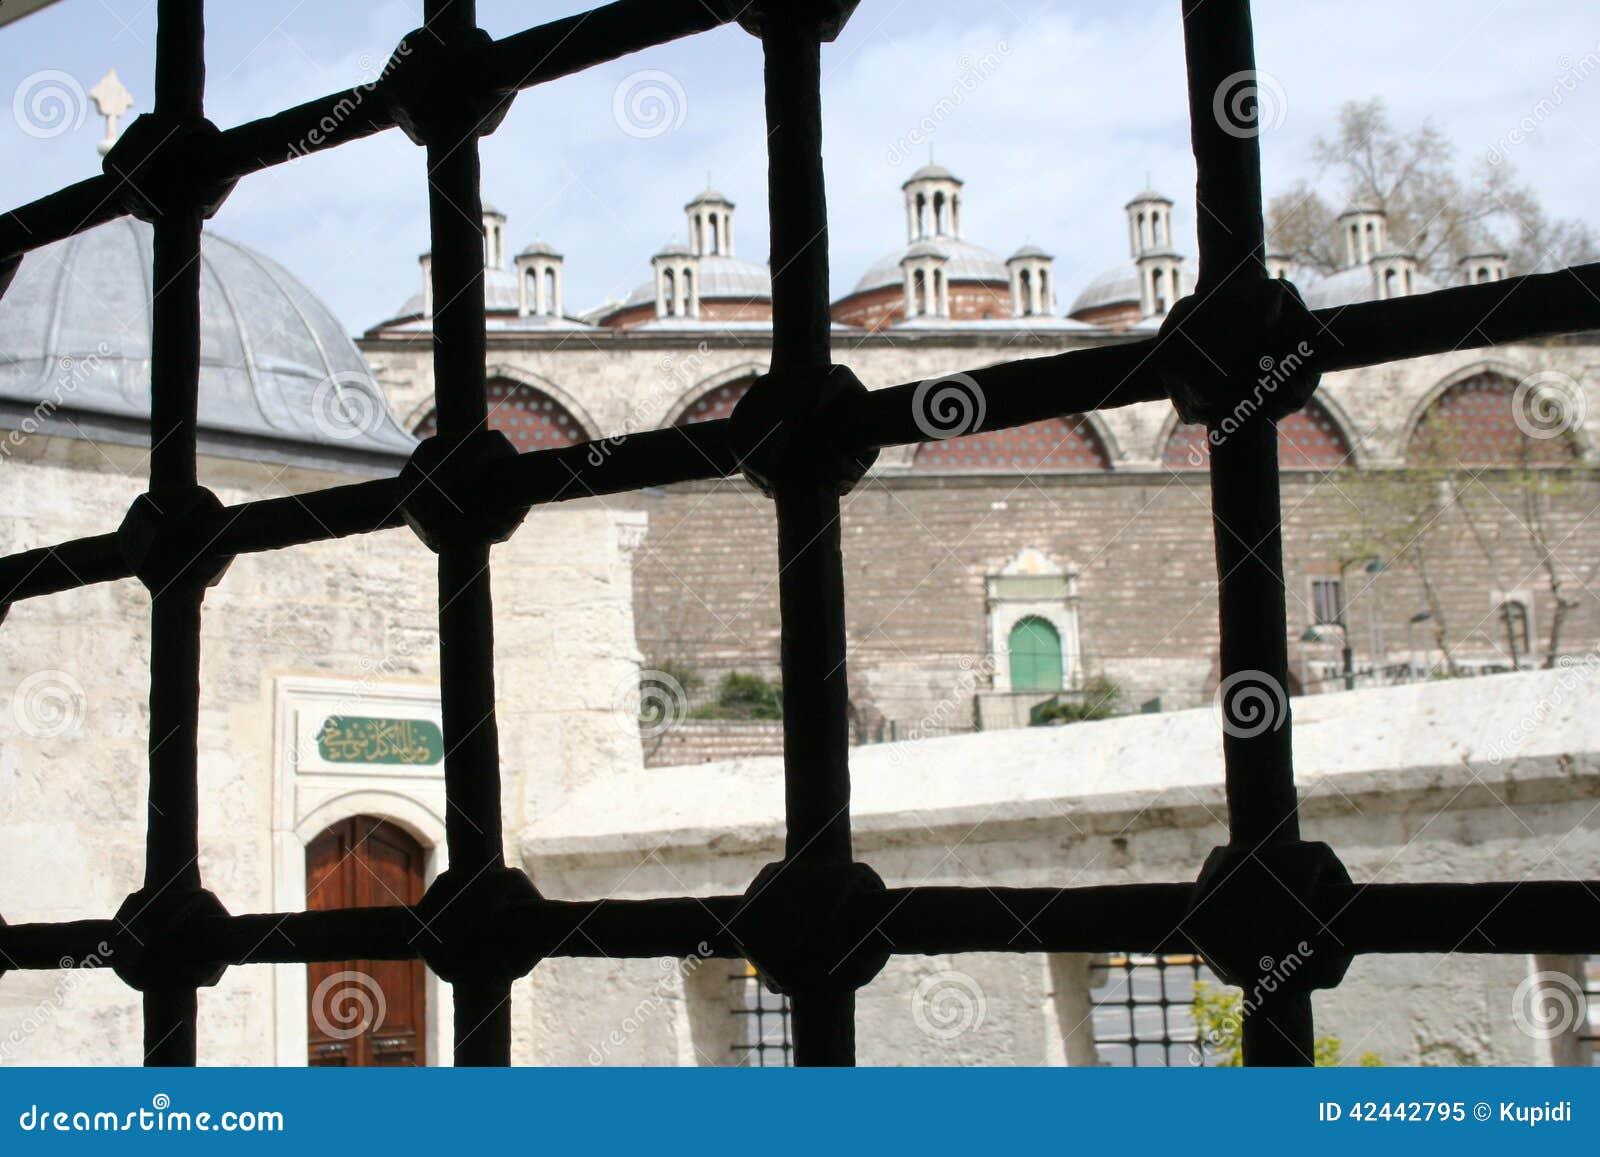 Kilic Ali Pasha Mosque Window